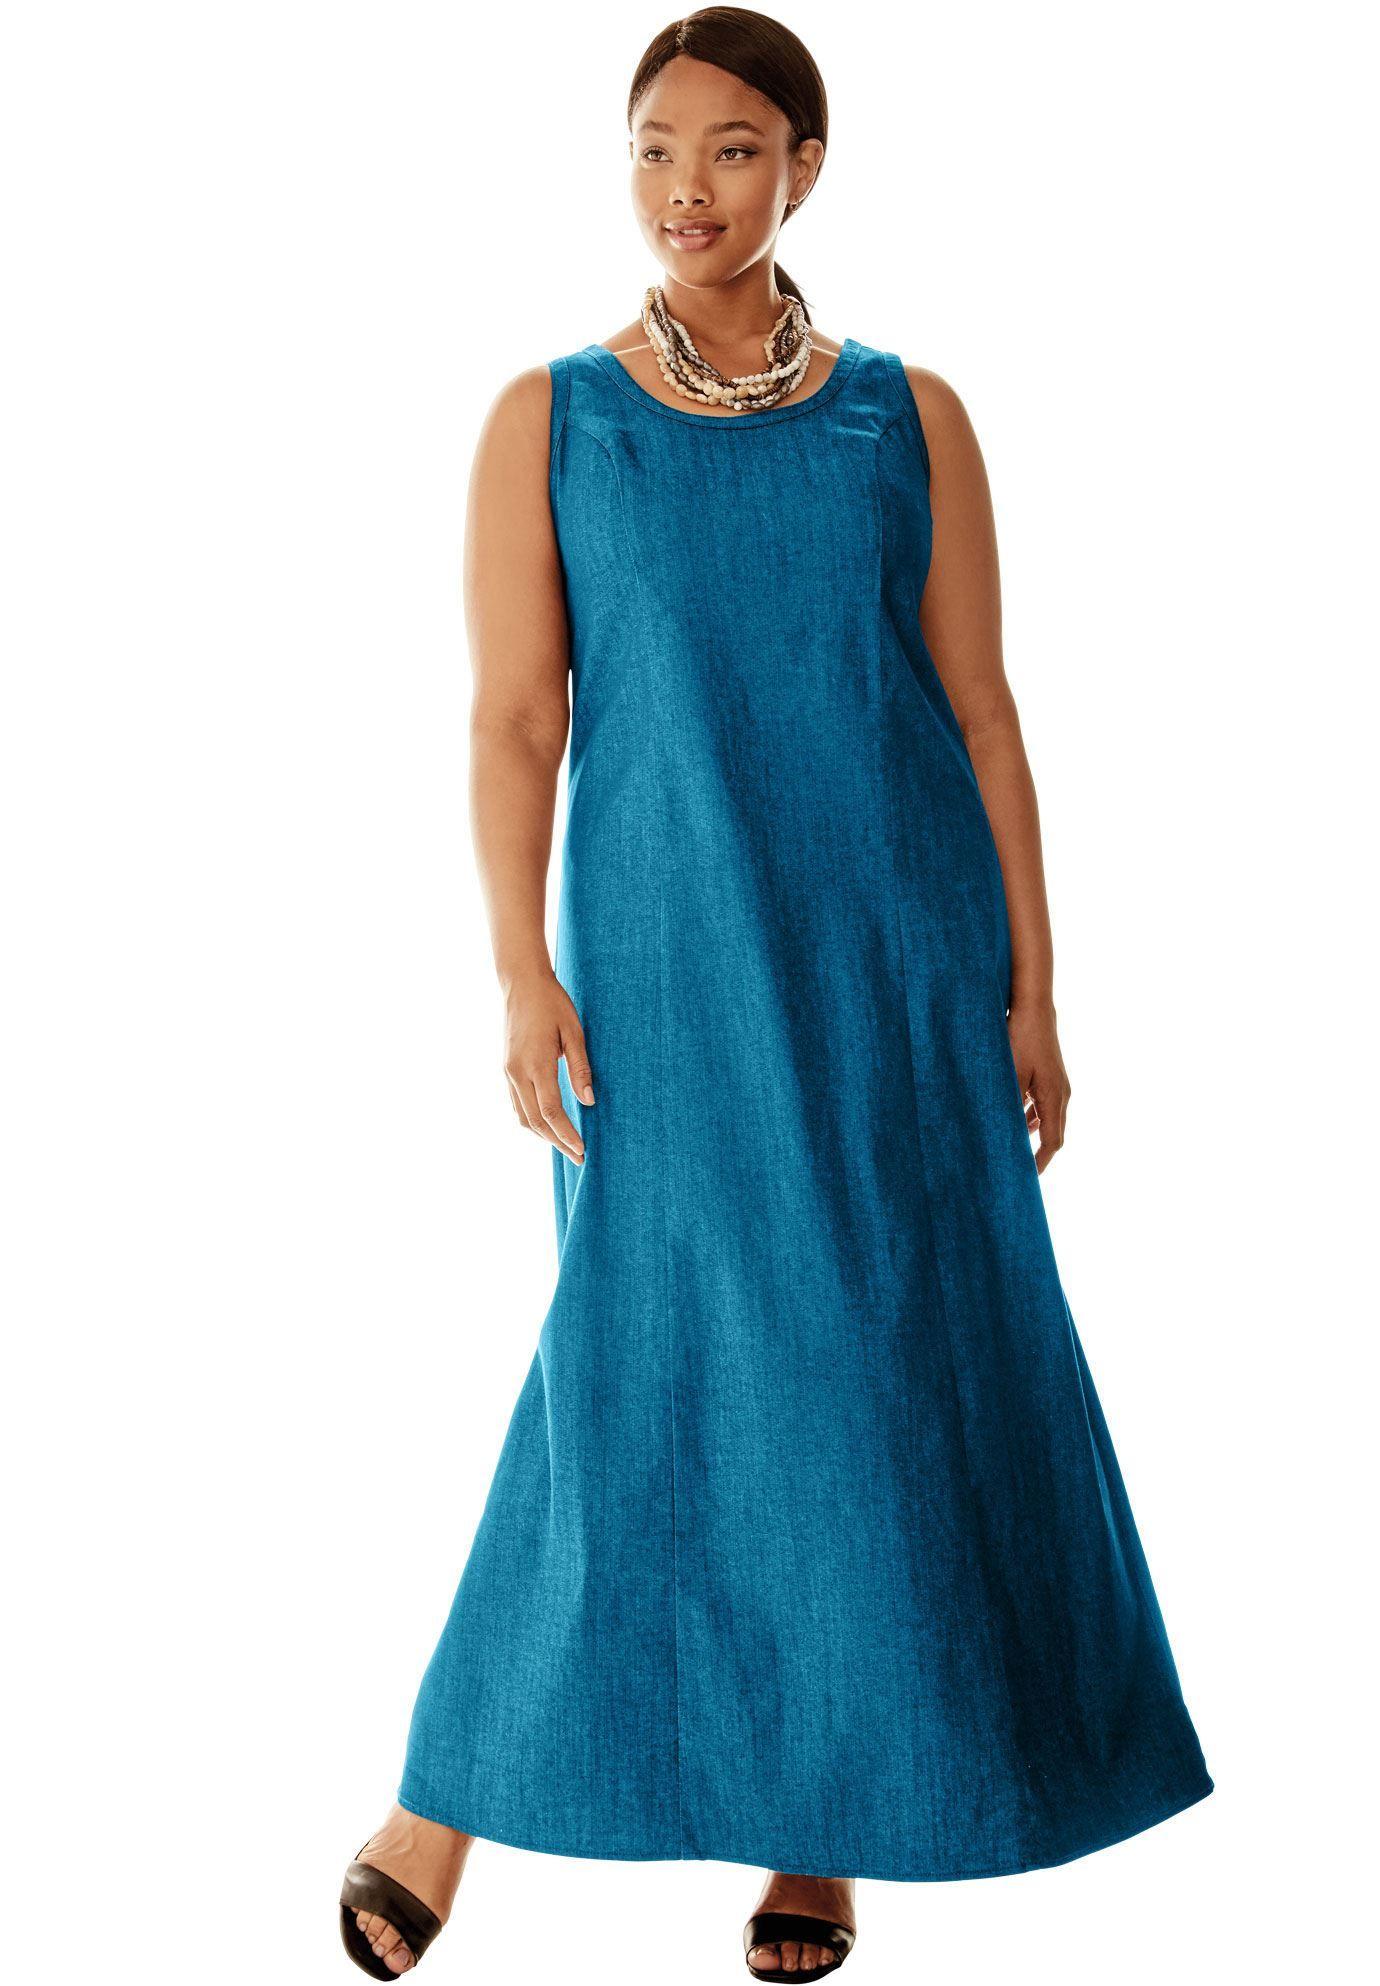 jessica london summer dresses